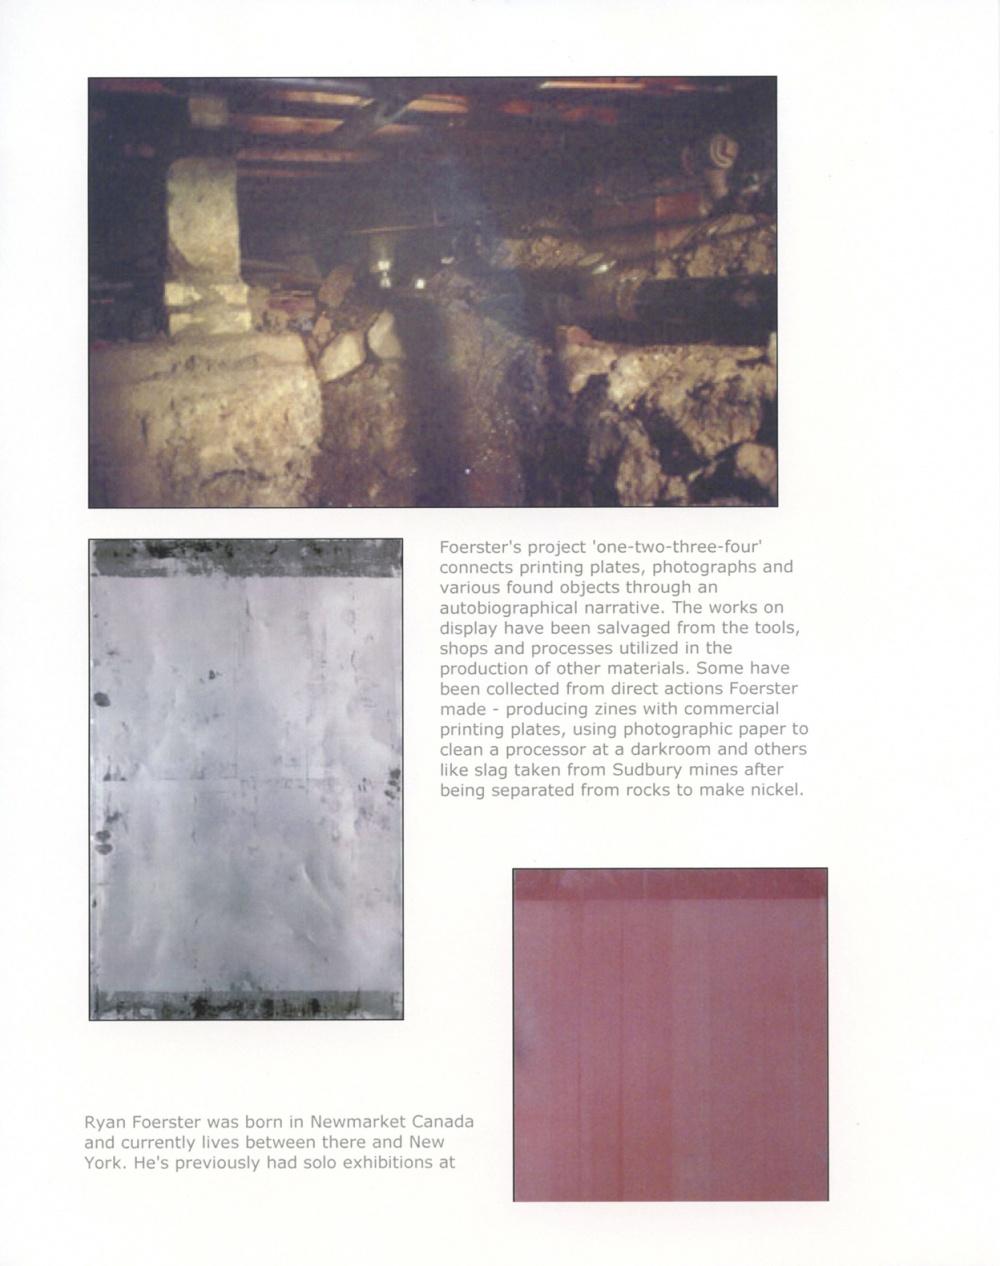 AMA1106.1, page 2